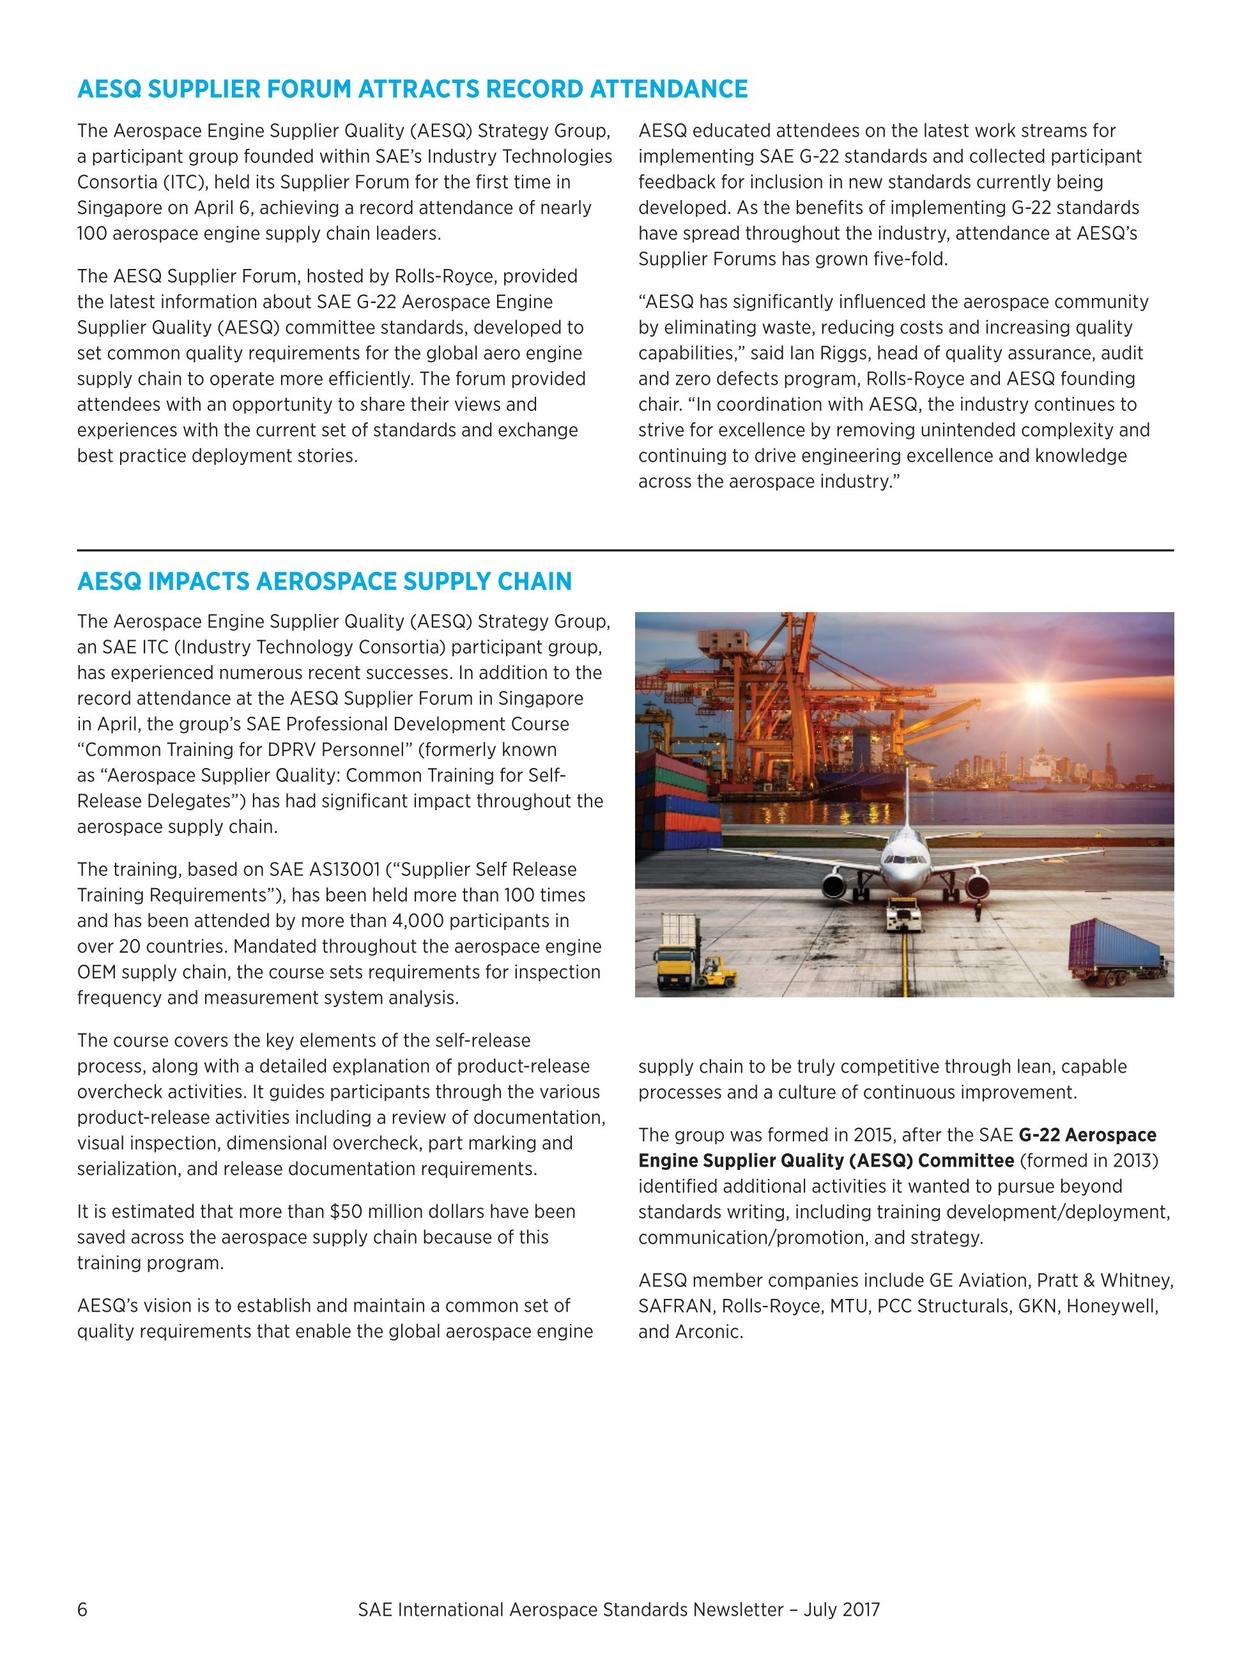 Aerospace Standards Newsletter - July 2017